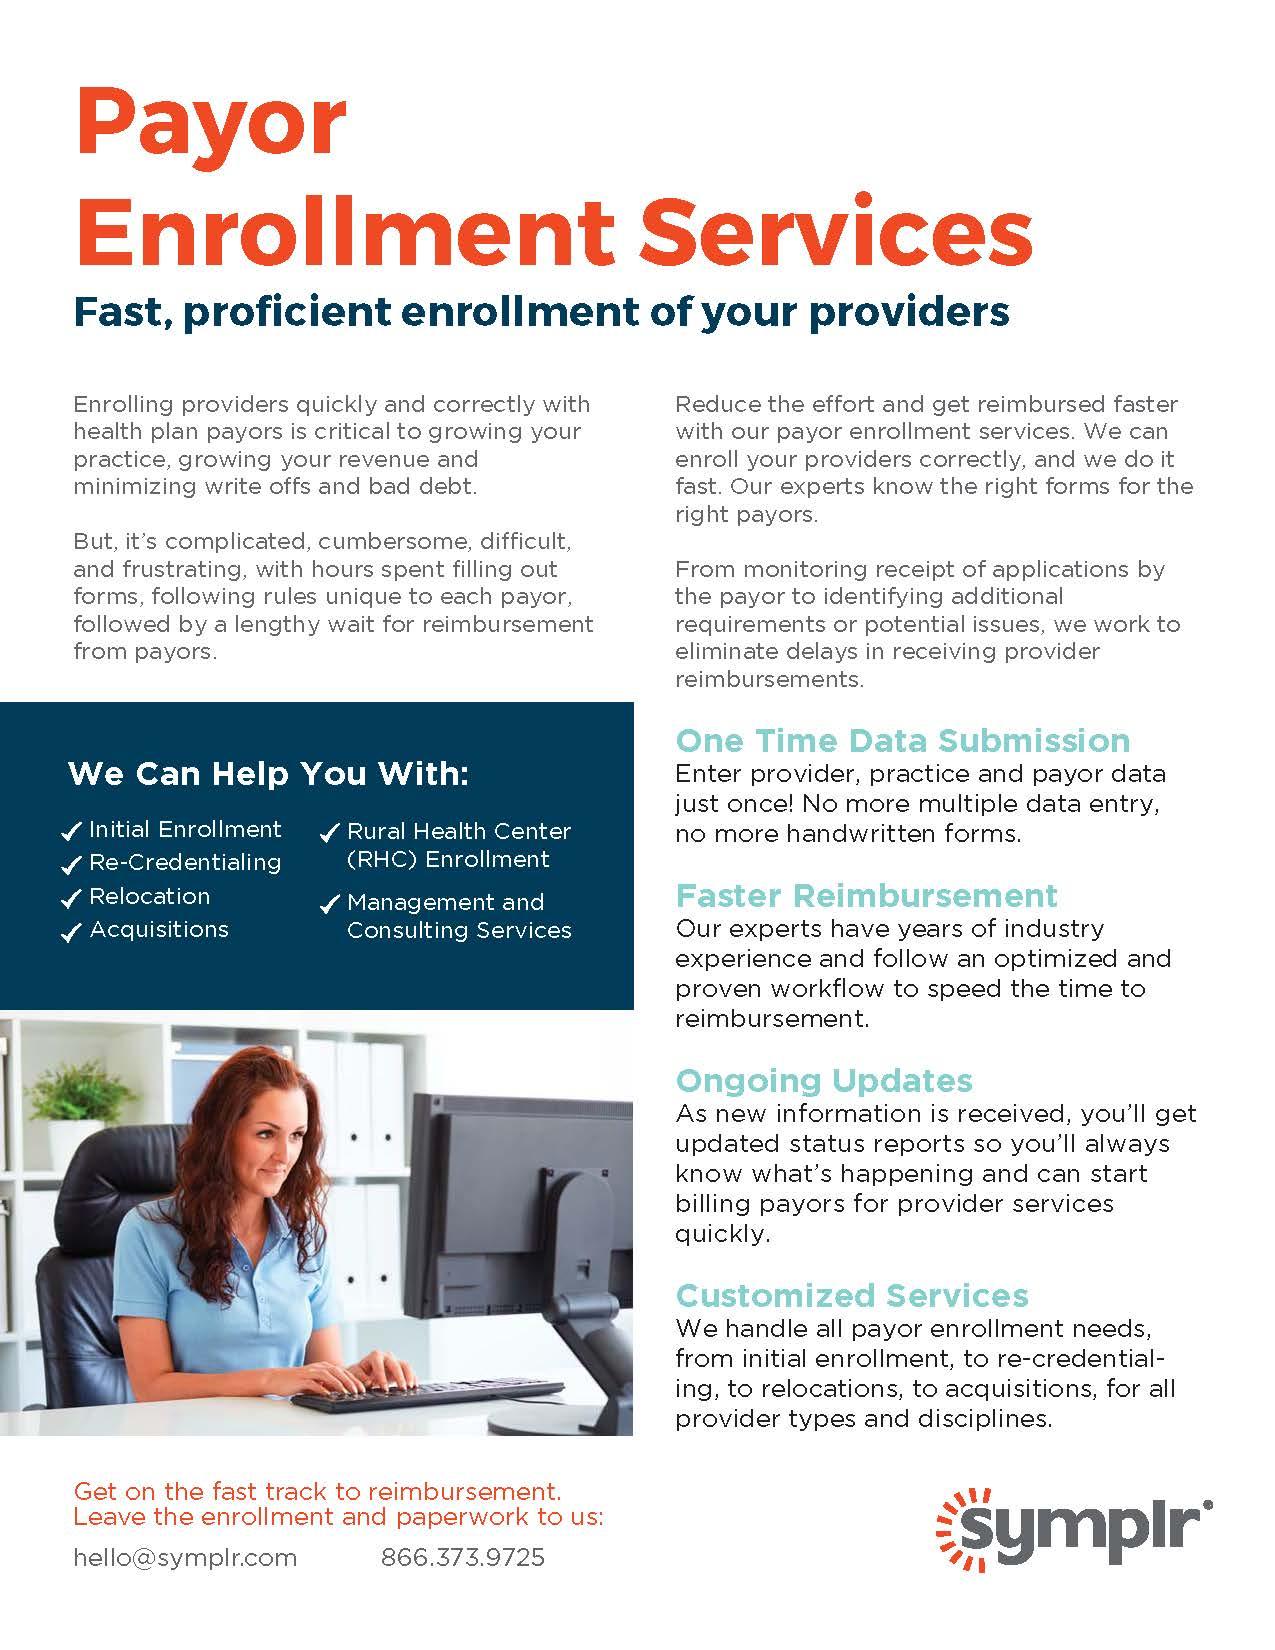 Payor_Enrollment_Services_Flyer.jpg